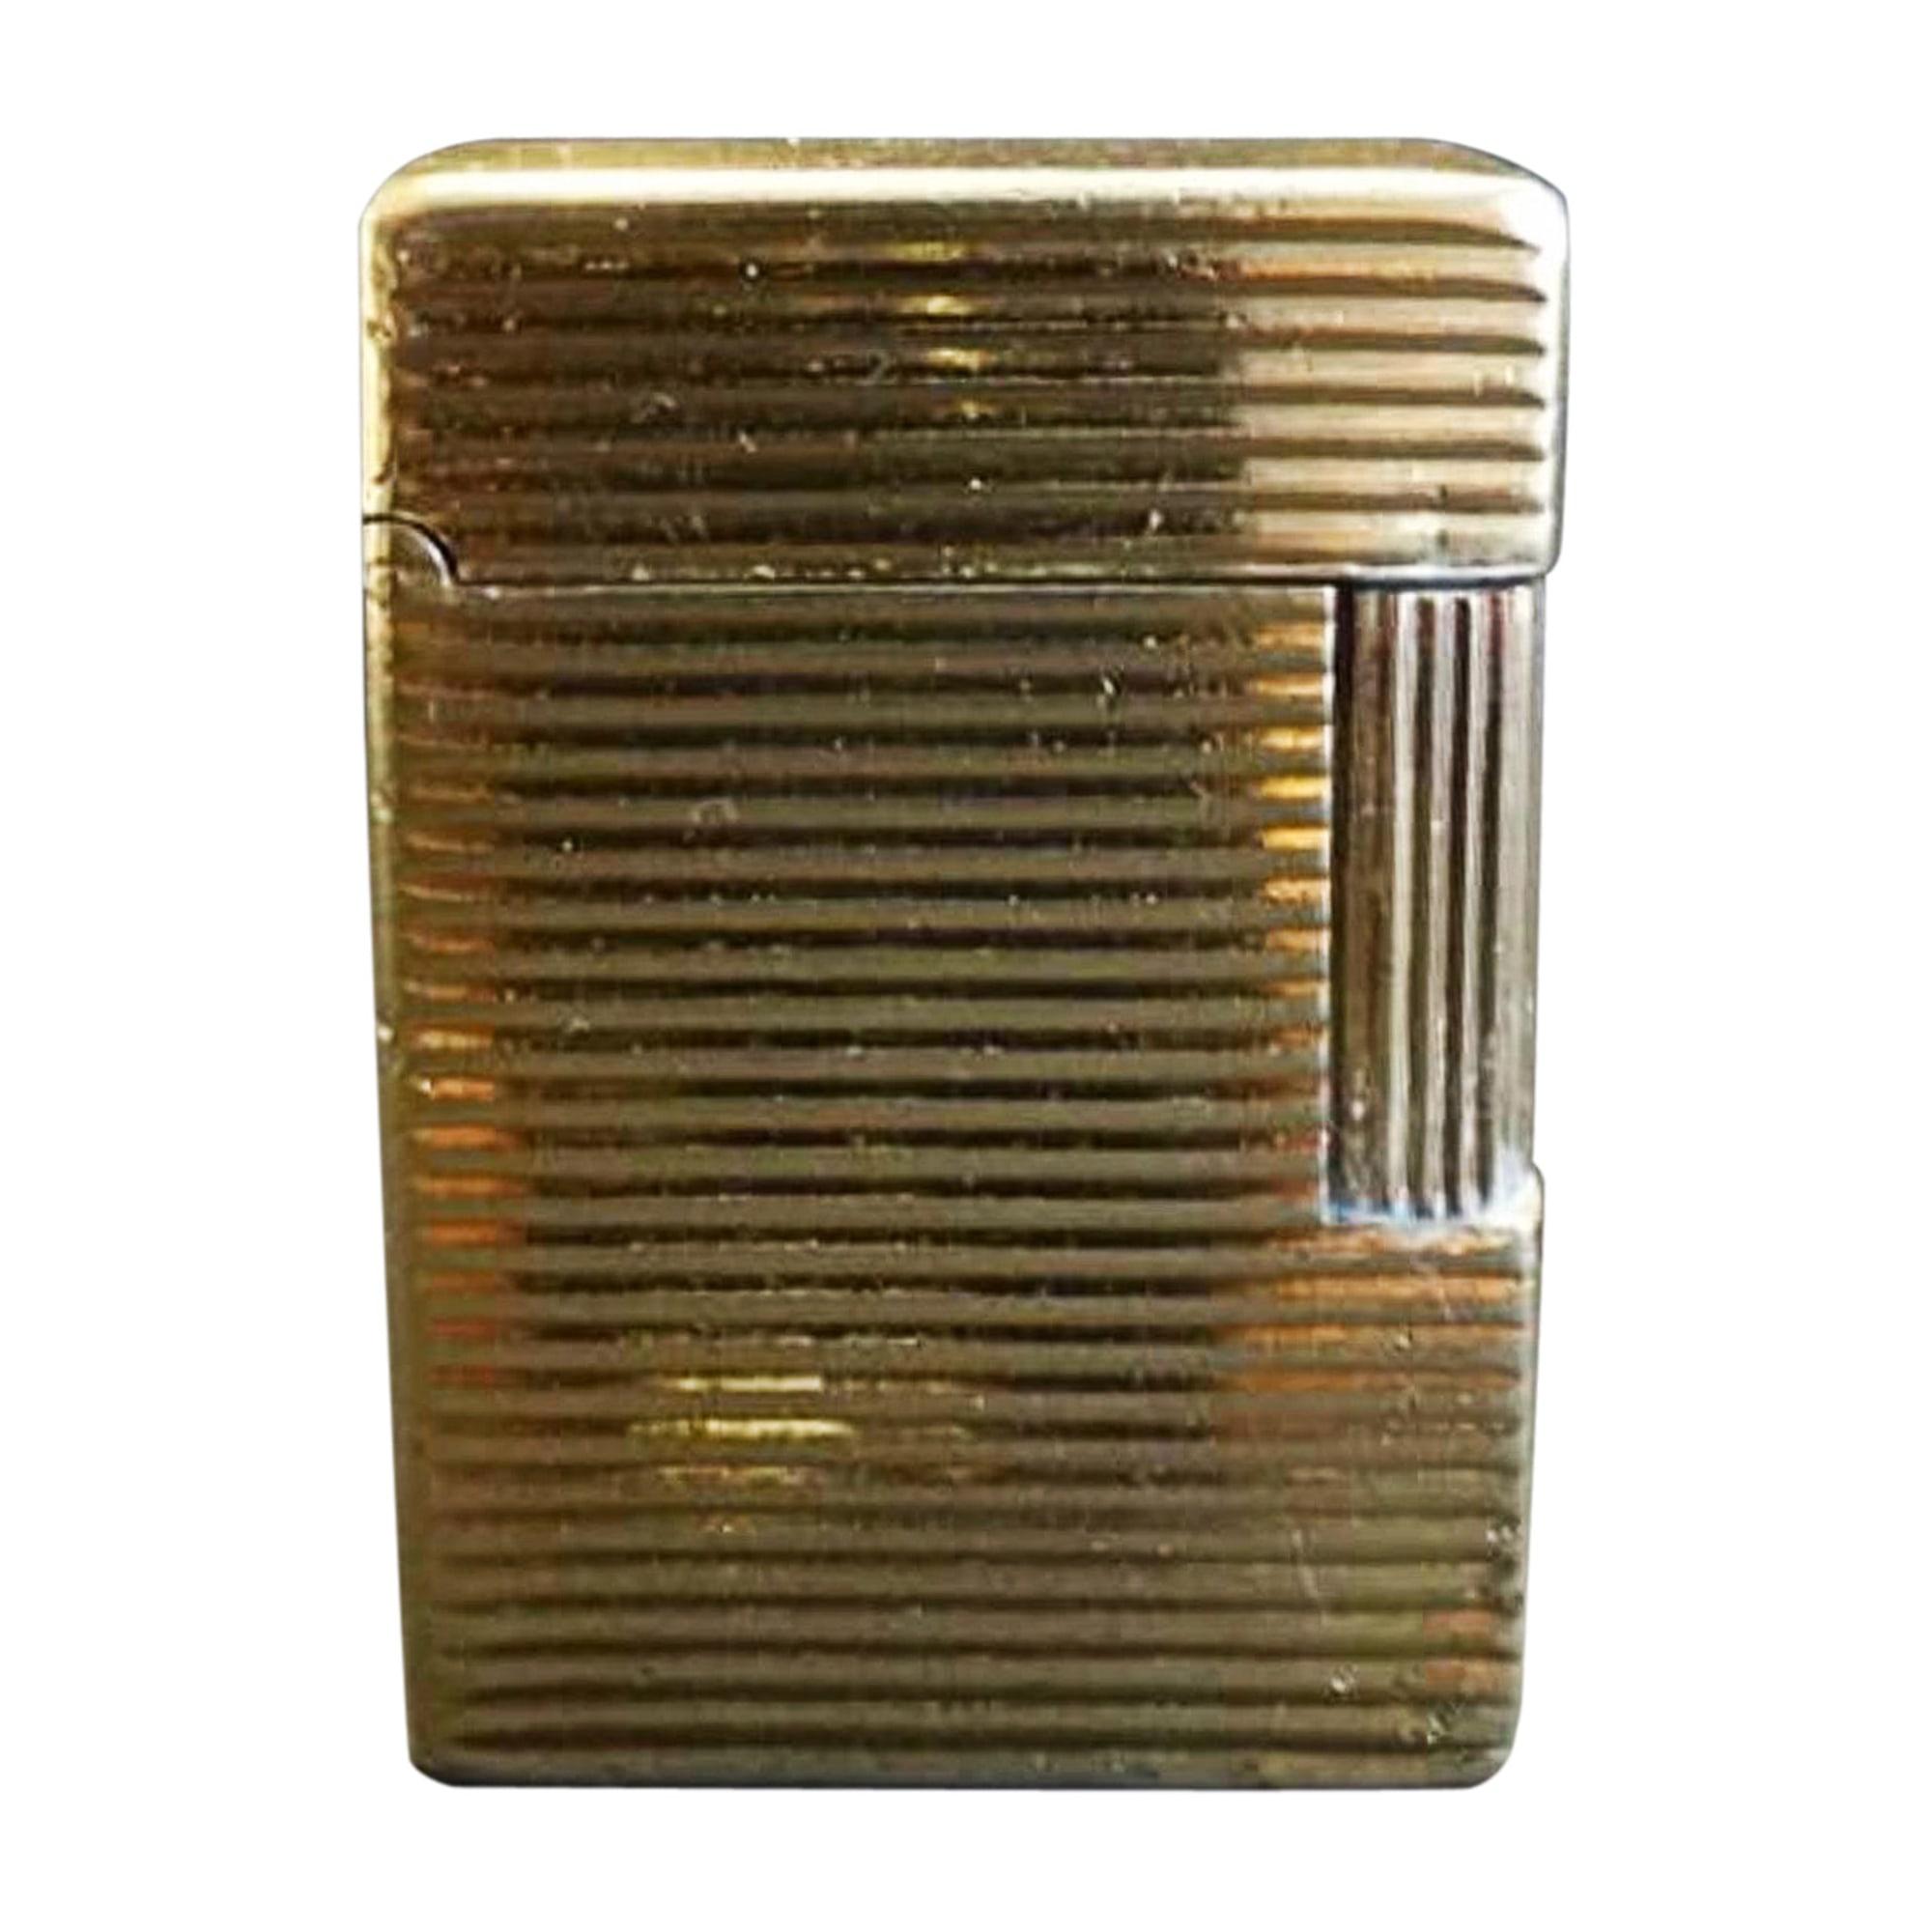 Gemelli ST DUPONT Dorato, bronzo, rame